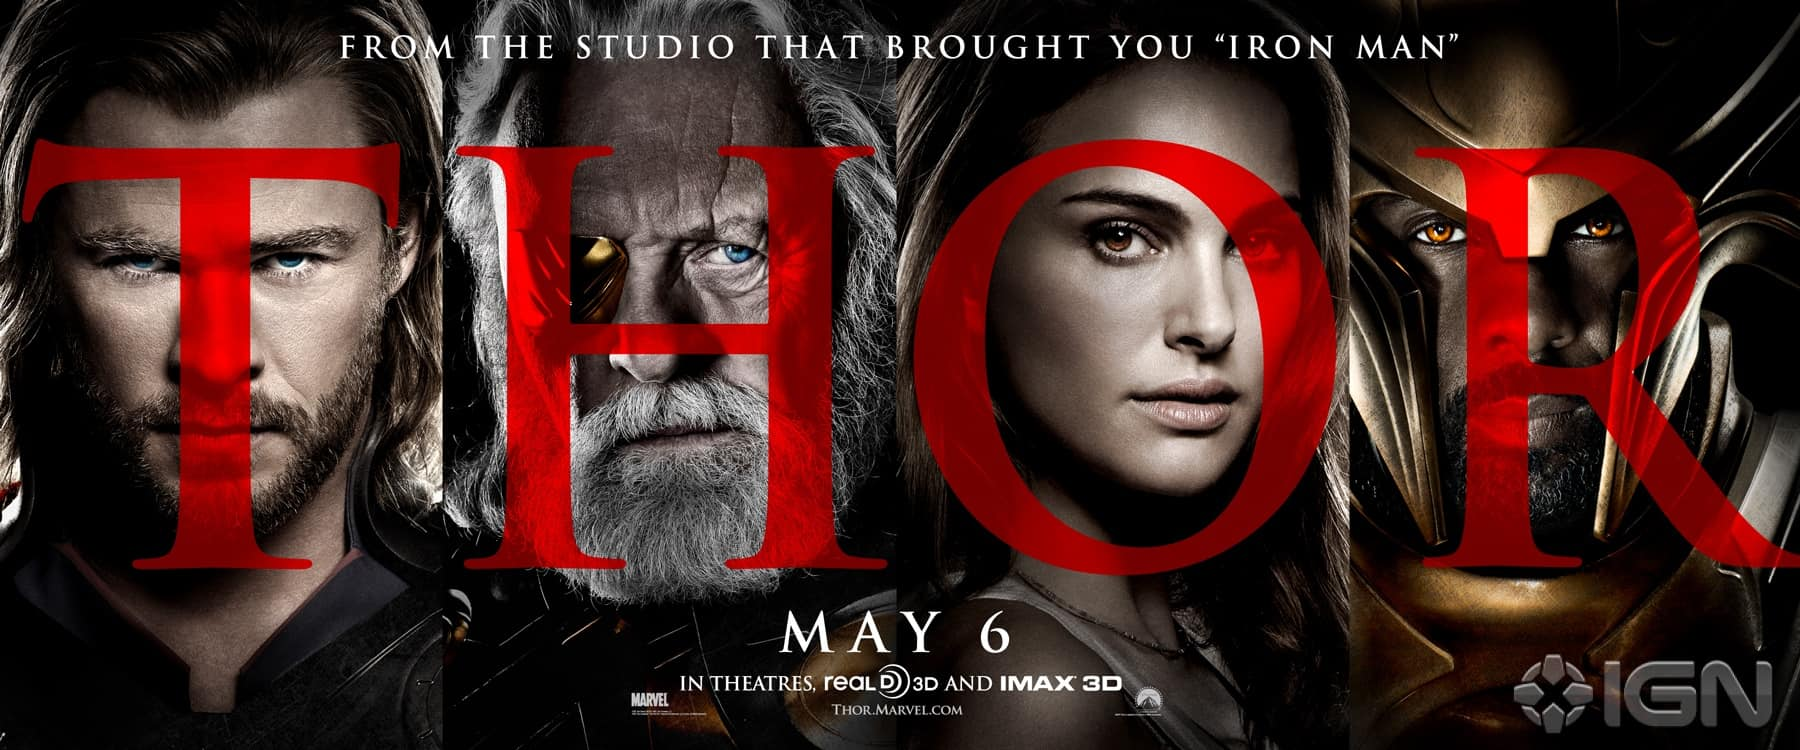 http://www.fmoreno.com.mx/wp-content/uploads/2011/05/Thor-Banner-021-300x125.jpg